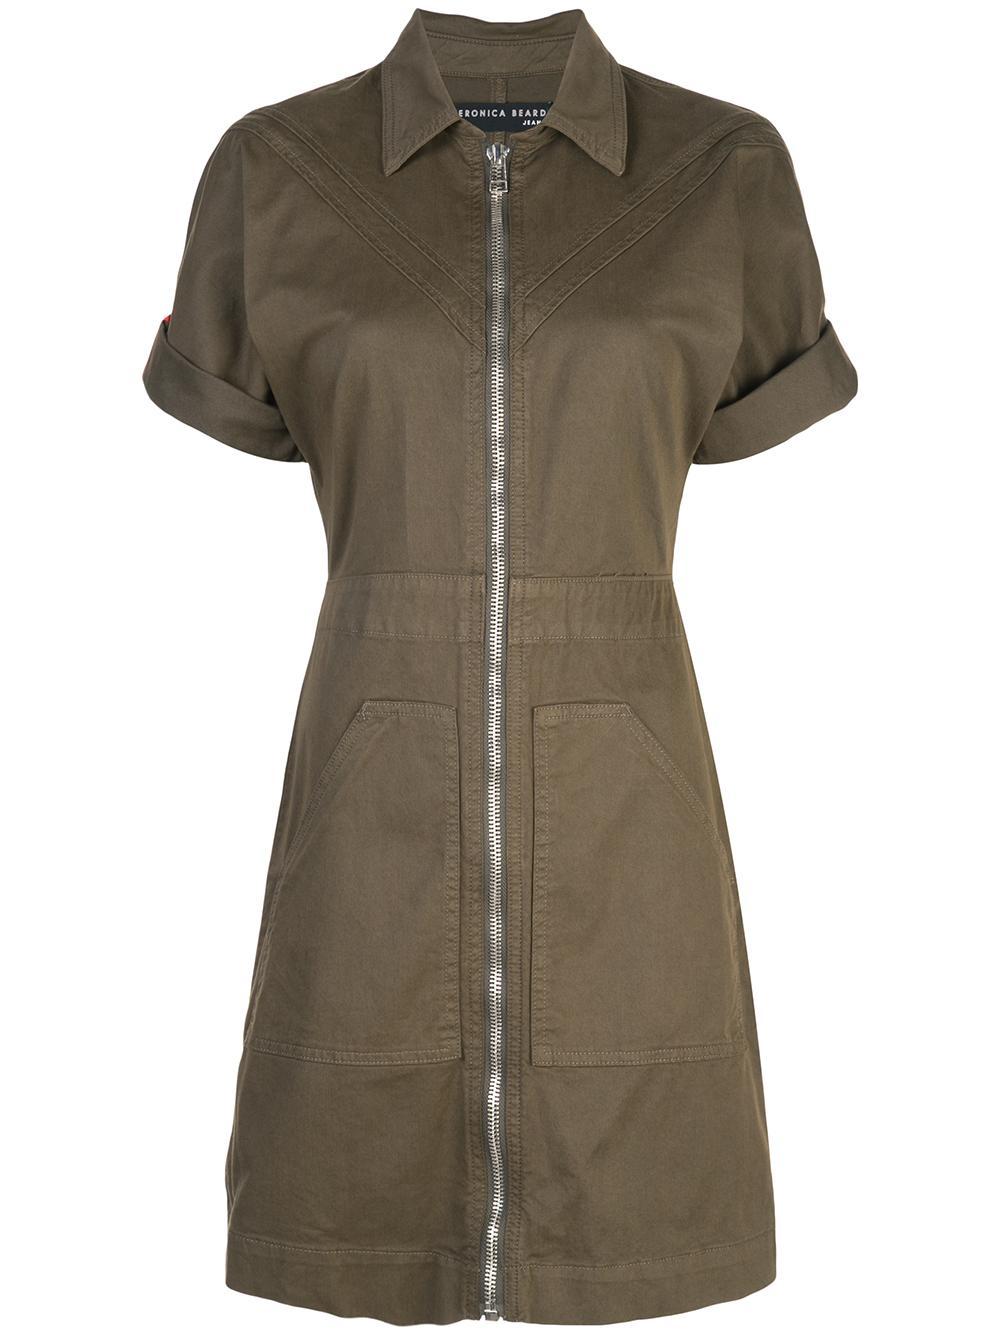 Dublin Short Sleeves Zip Up Dress Item # J4540410